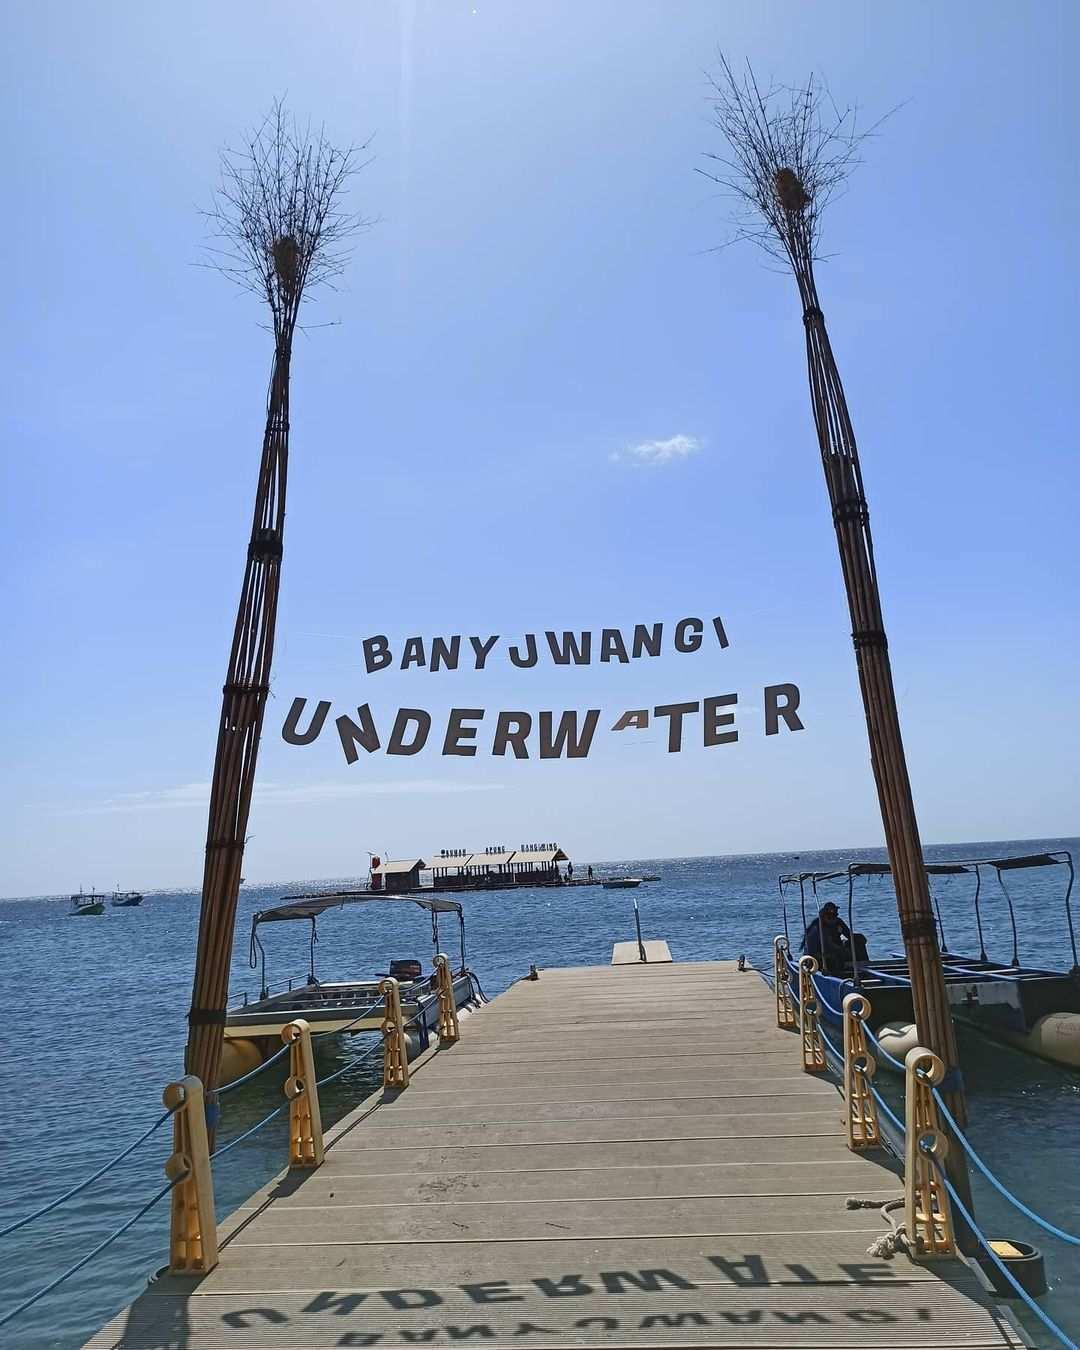 Dermaga di Bangsring Underwater Banyuwangi Image From @lagimaufotoaja